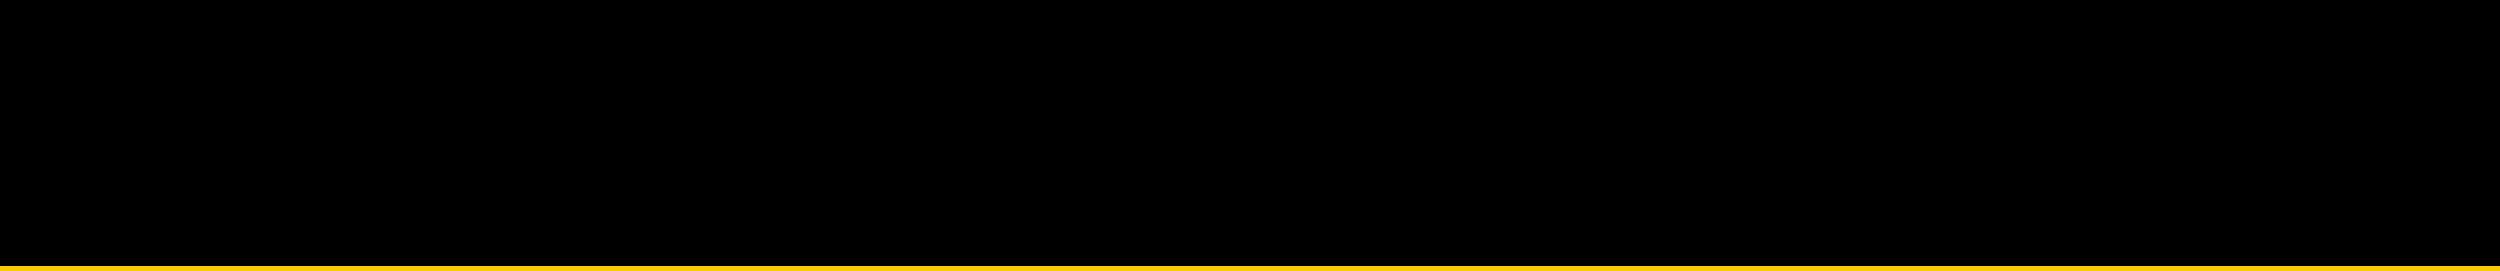 tangier-island-titles5.png